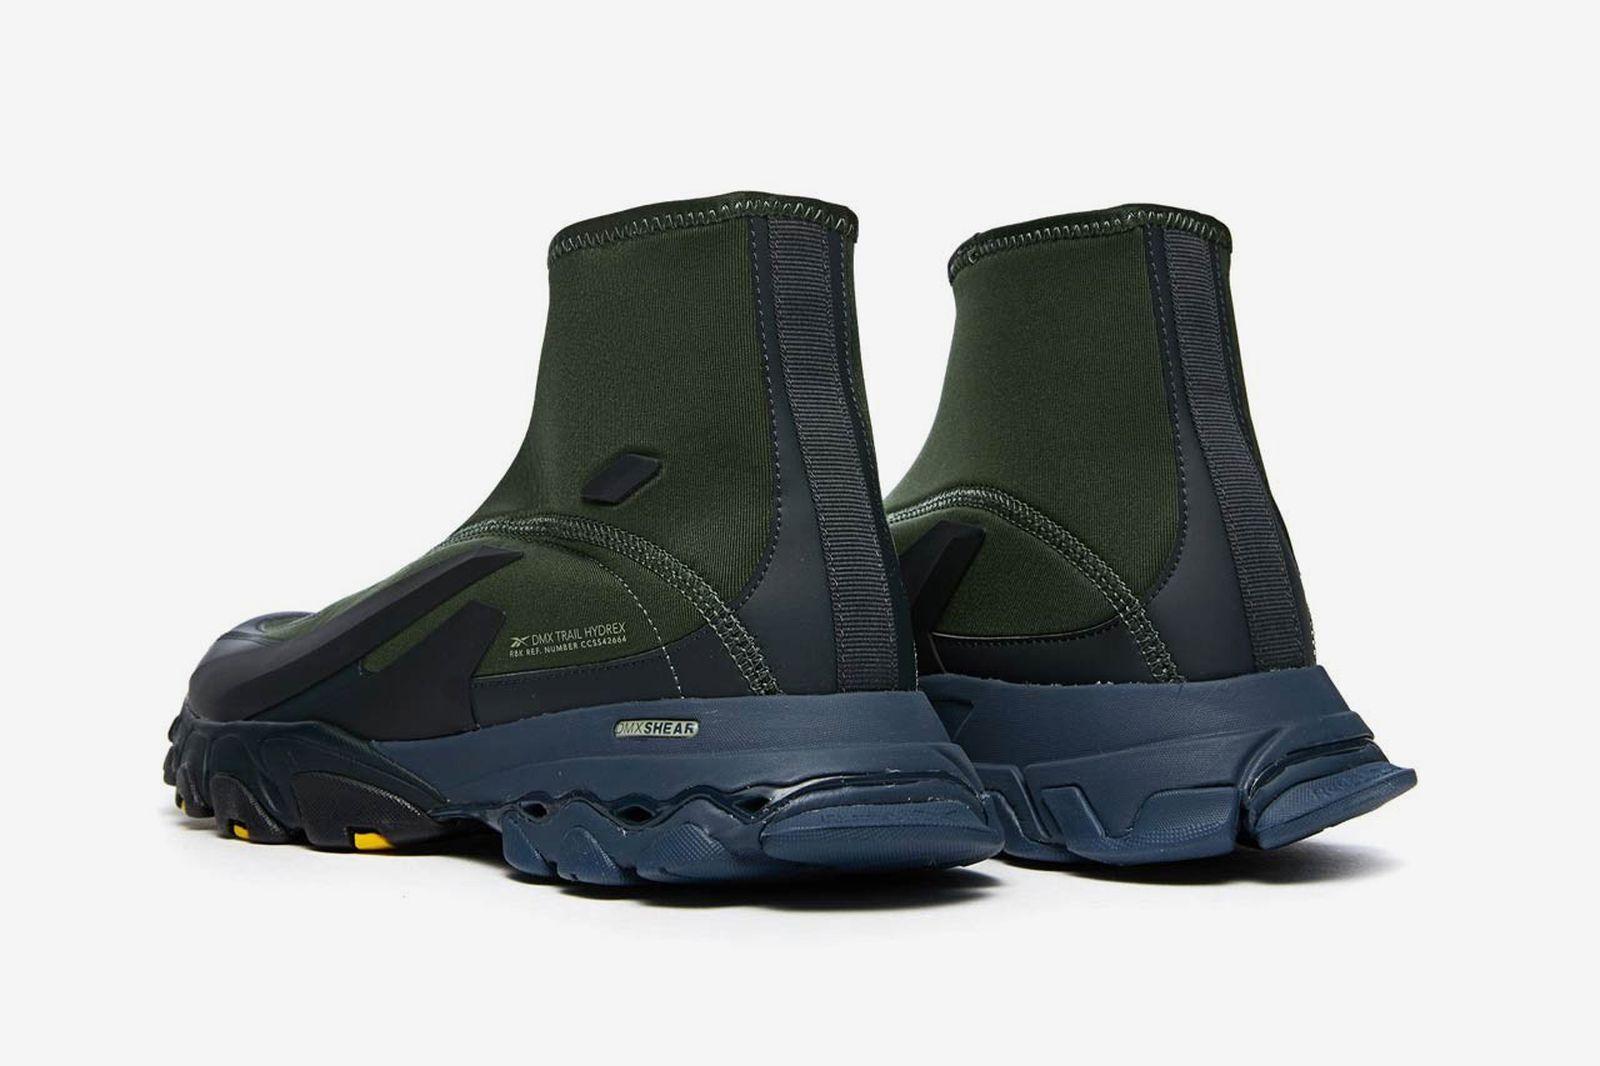 reebok-dmx-trail-hydrex-primal-green-release-date-price-03